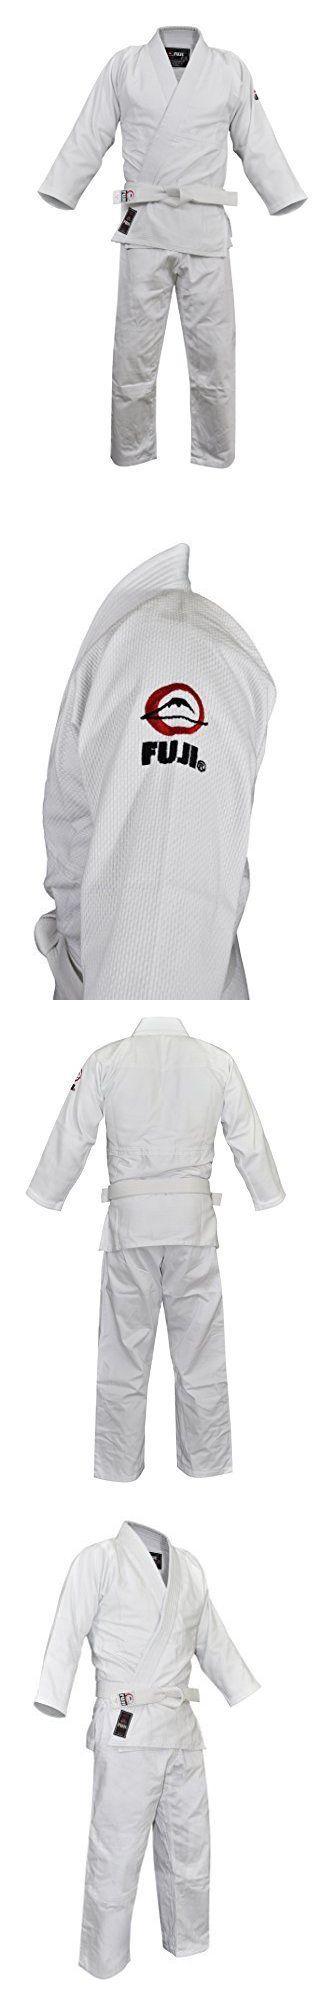 Jackets 179771: Fuji Judo Uniform White 4 Mens Martial Arts Uniform Jacket, New -> BUY IT NOW ONLY: $62.05 on eBay!